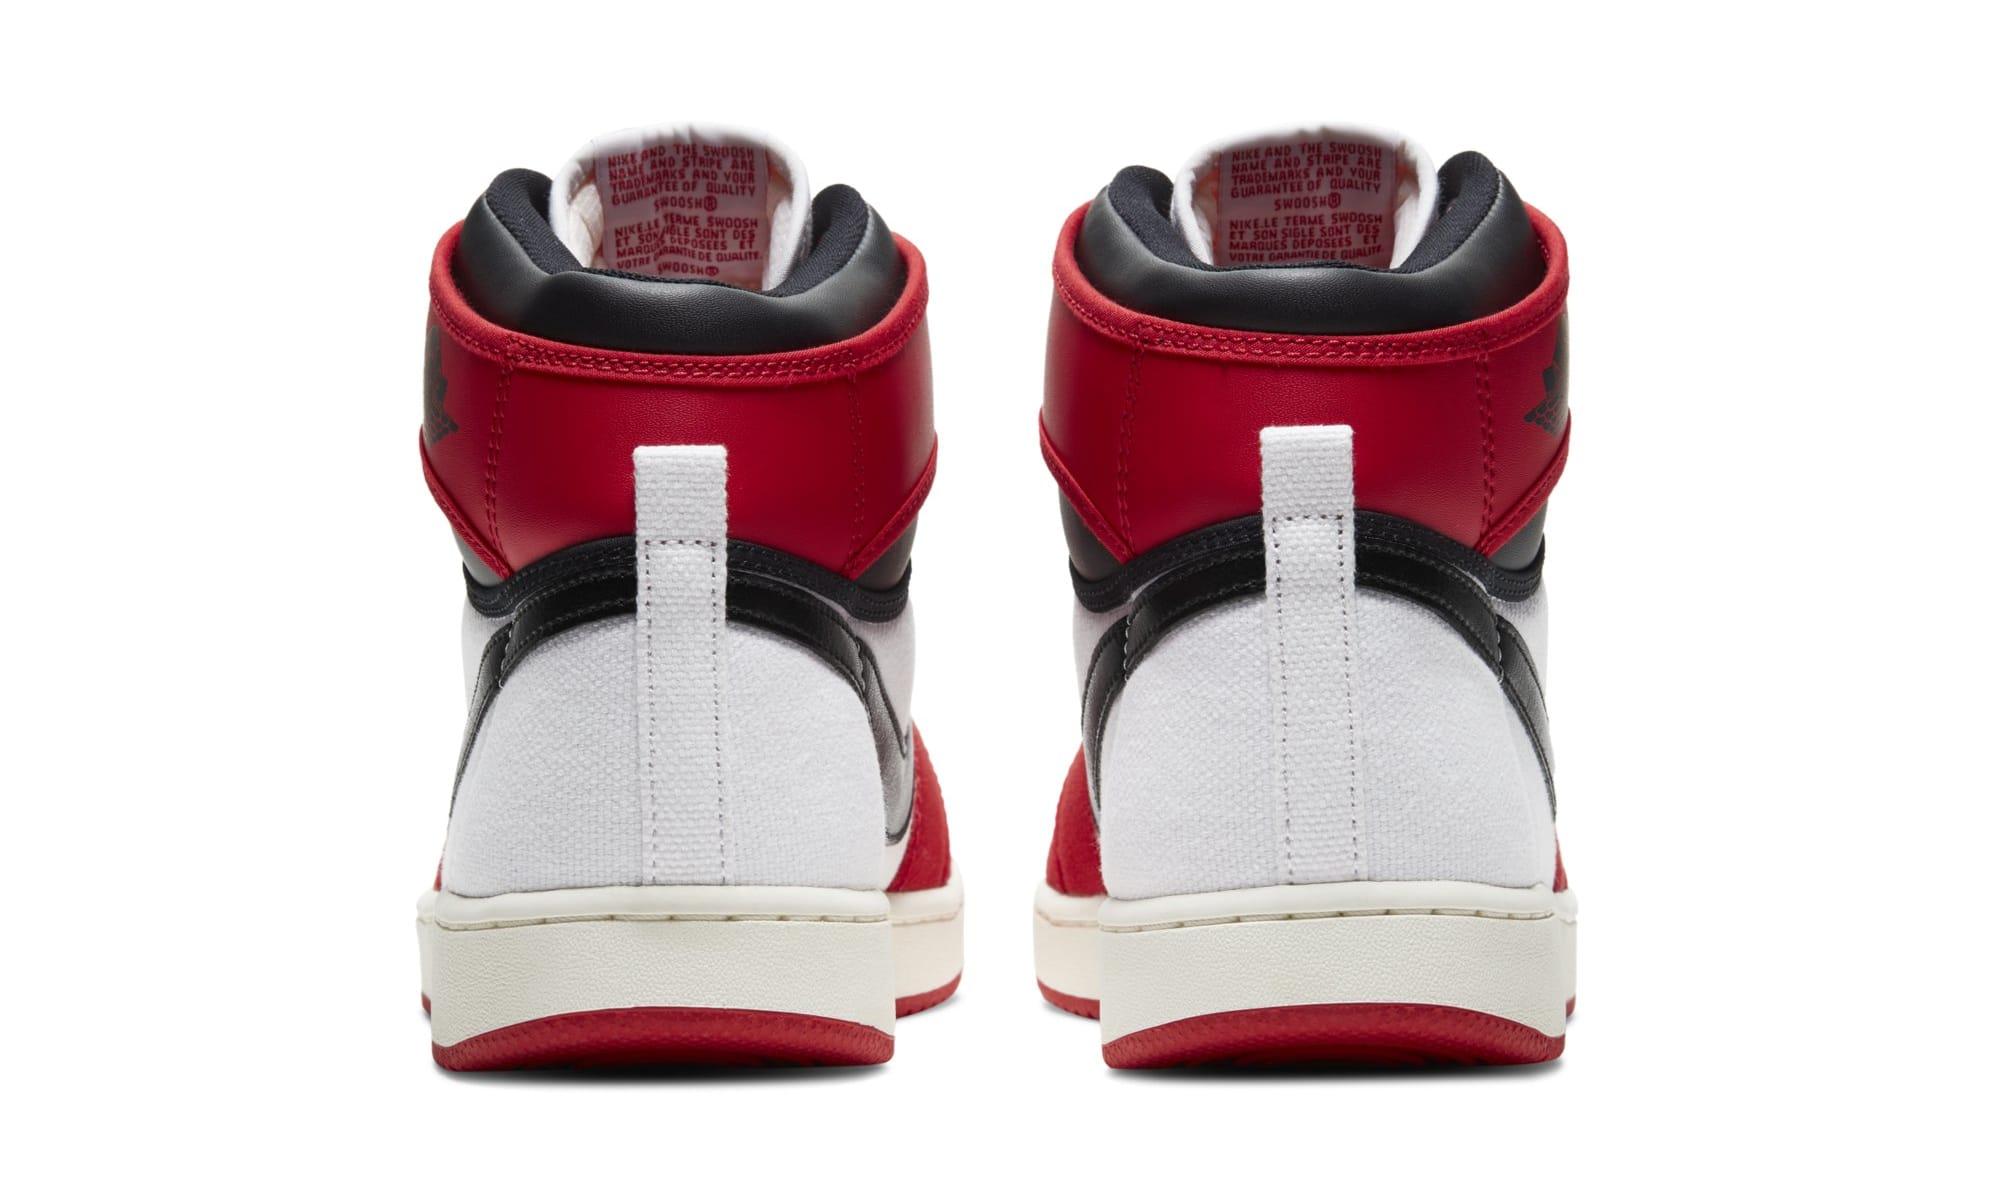 Air Jordan 1 KO 'Chicago' DA9089-100 (Heel)